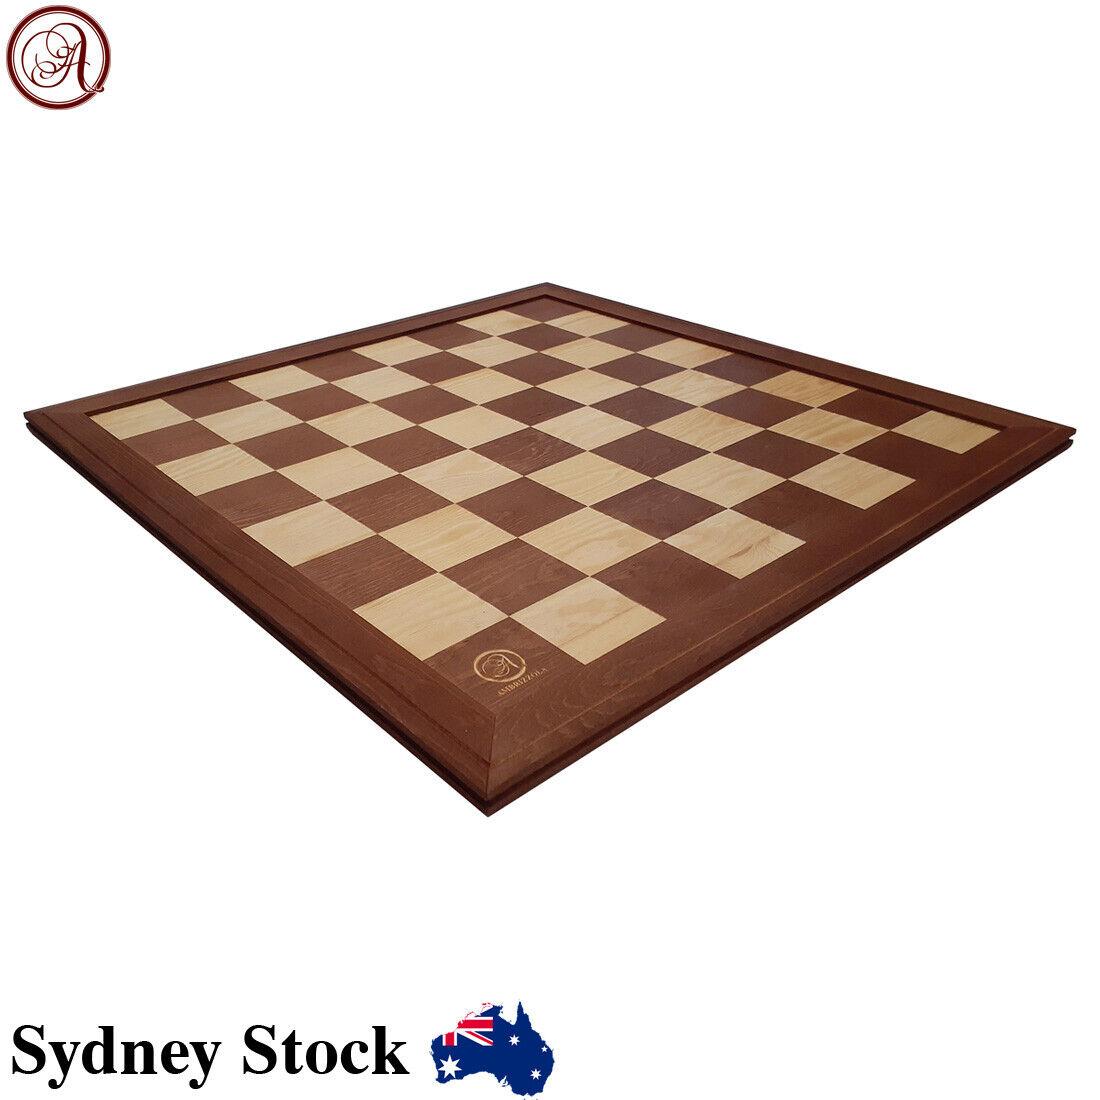 AMBRIZZOLA Wooden Chess Draughts /& Backgammon Storage Box